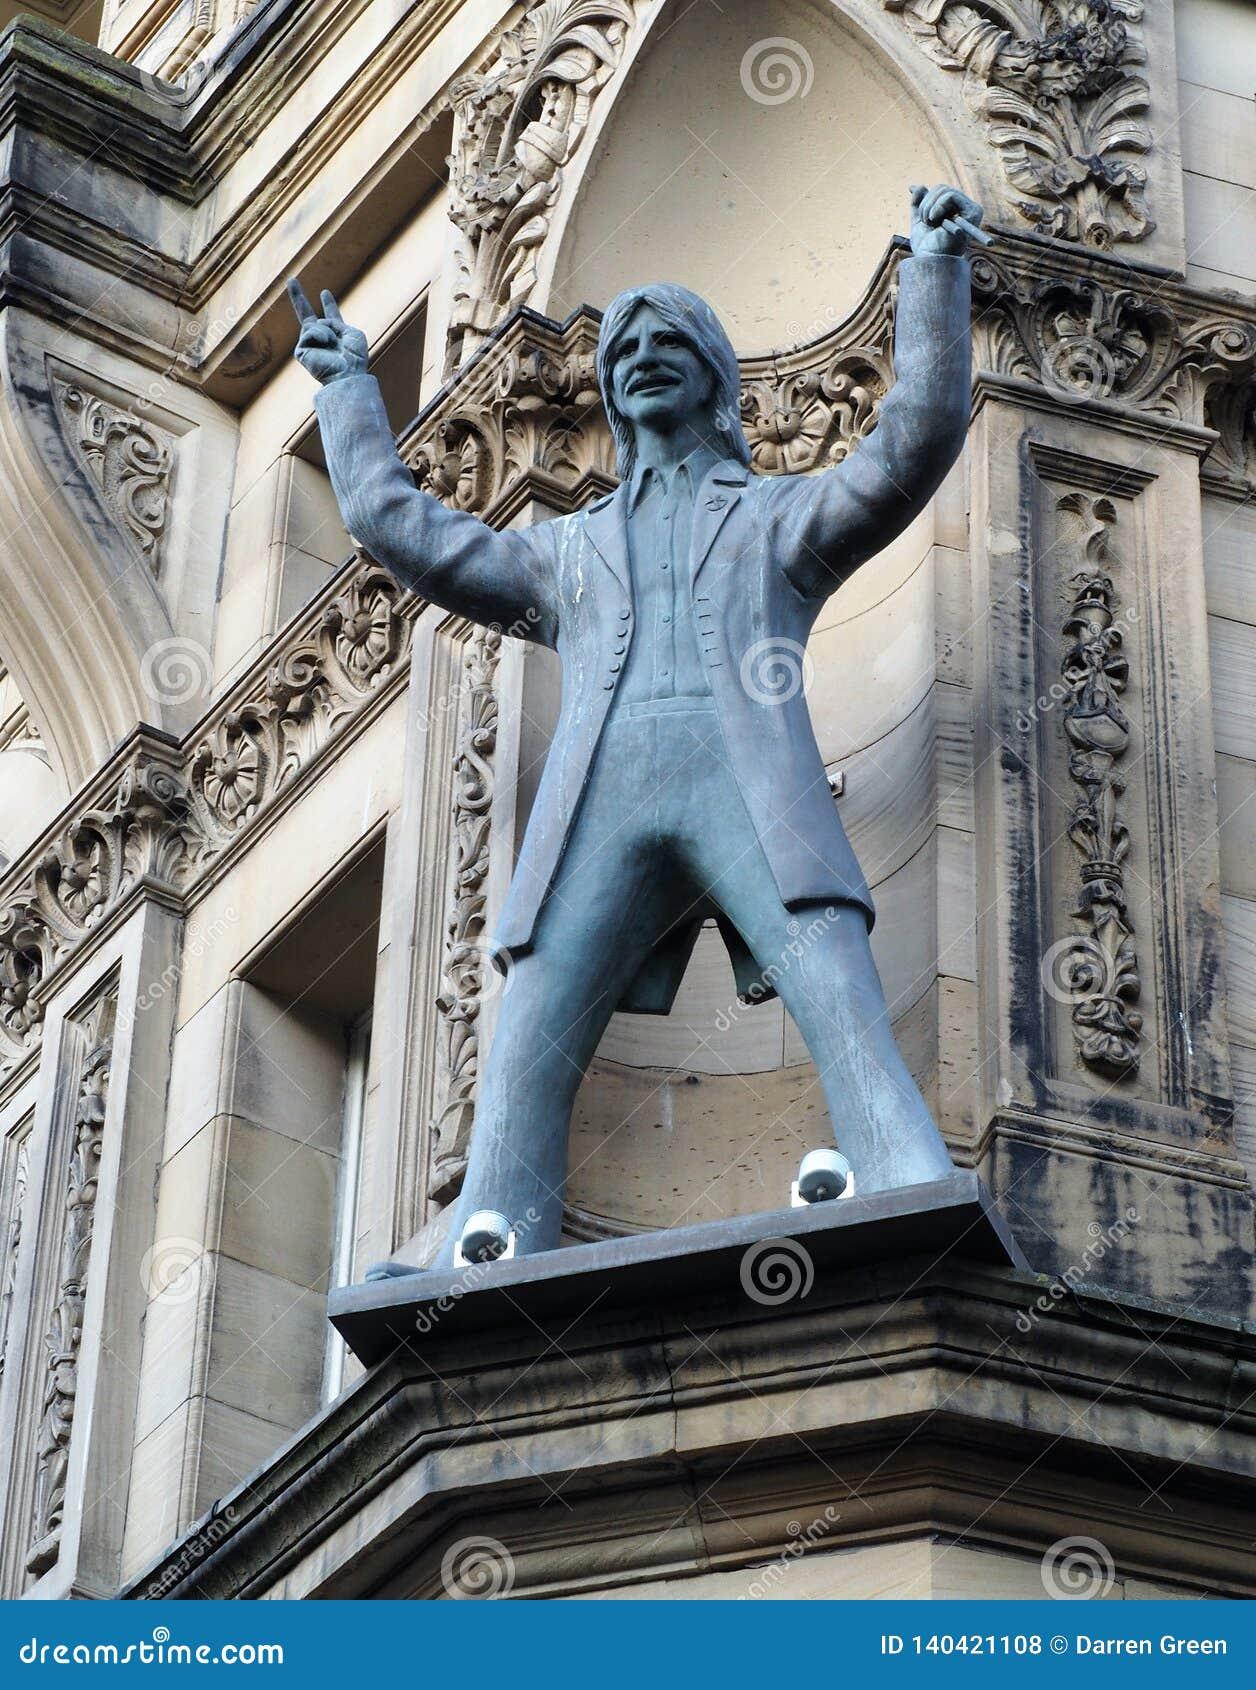 Statue of Beatles Drummer Ringo Starr, Liverpool